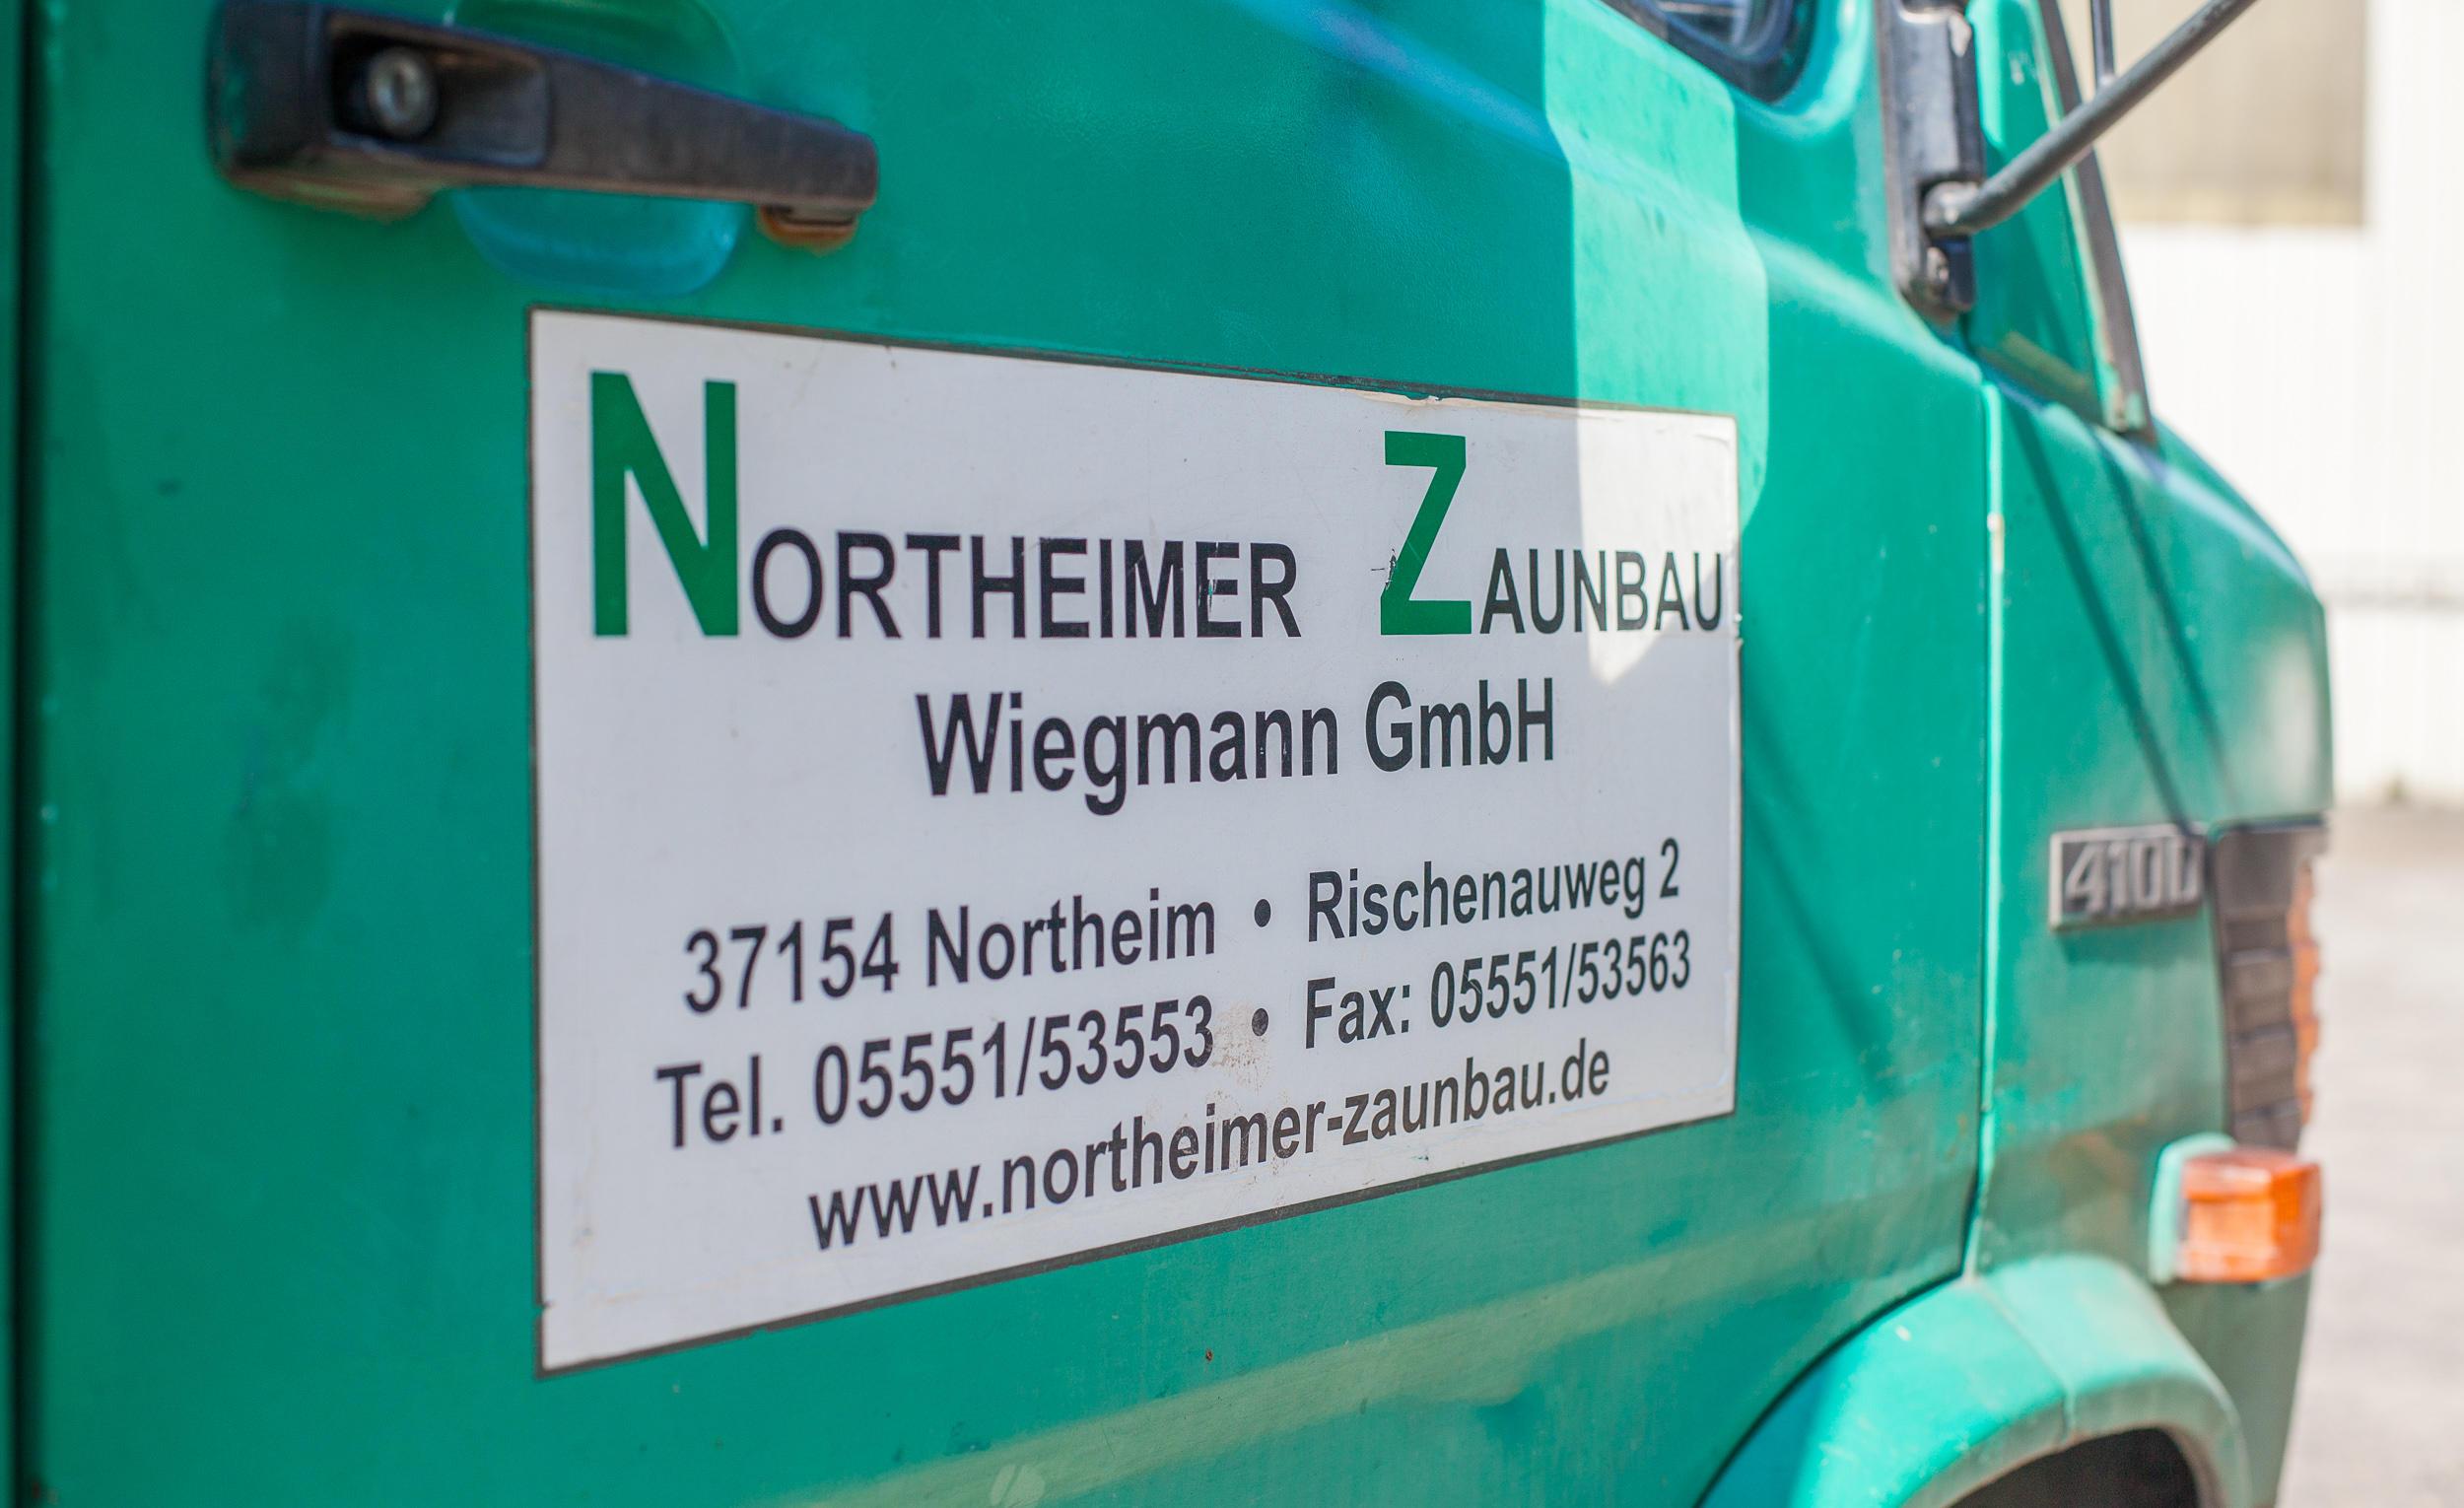 Northeimer Zaunbau Ralf Wiegmann GmbH